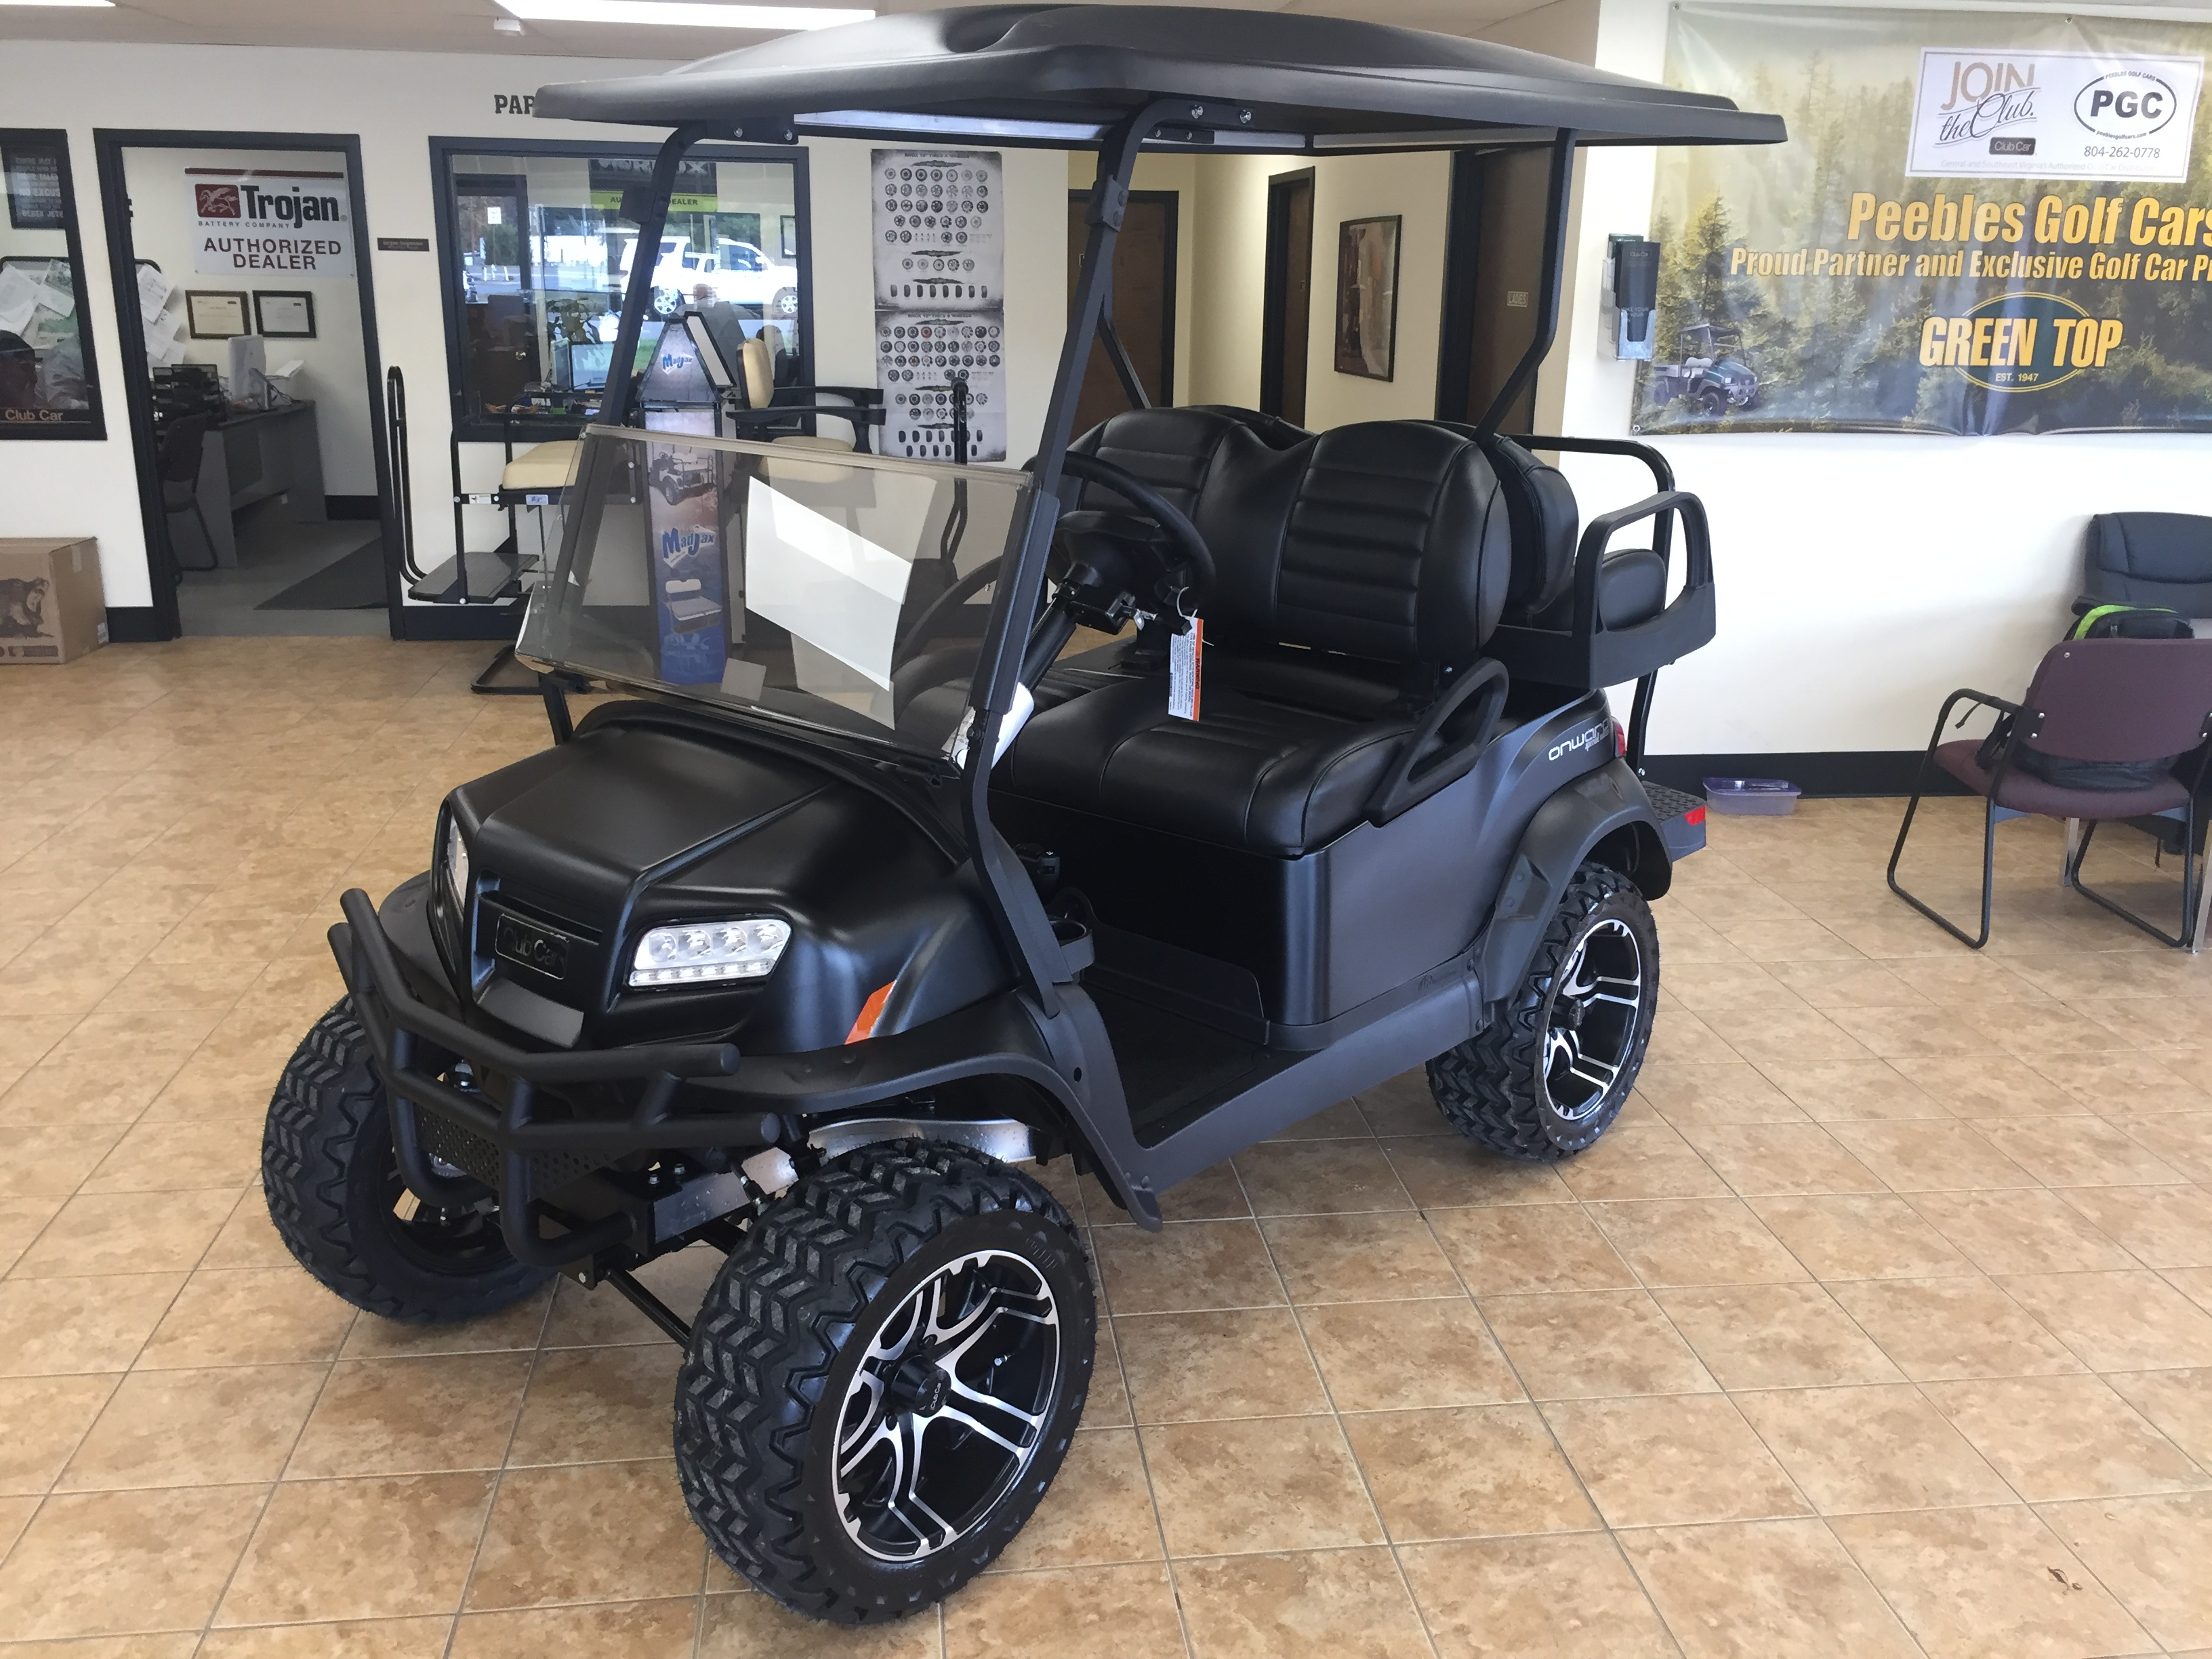 2019 Special Edition Onward Electric Golf Car Matte Black Peebles